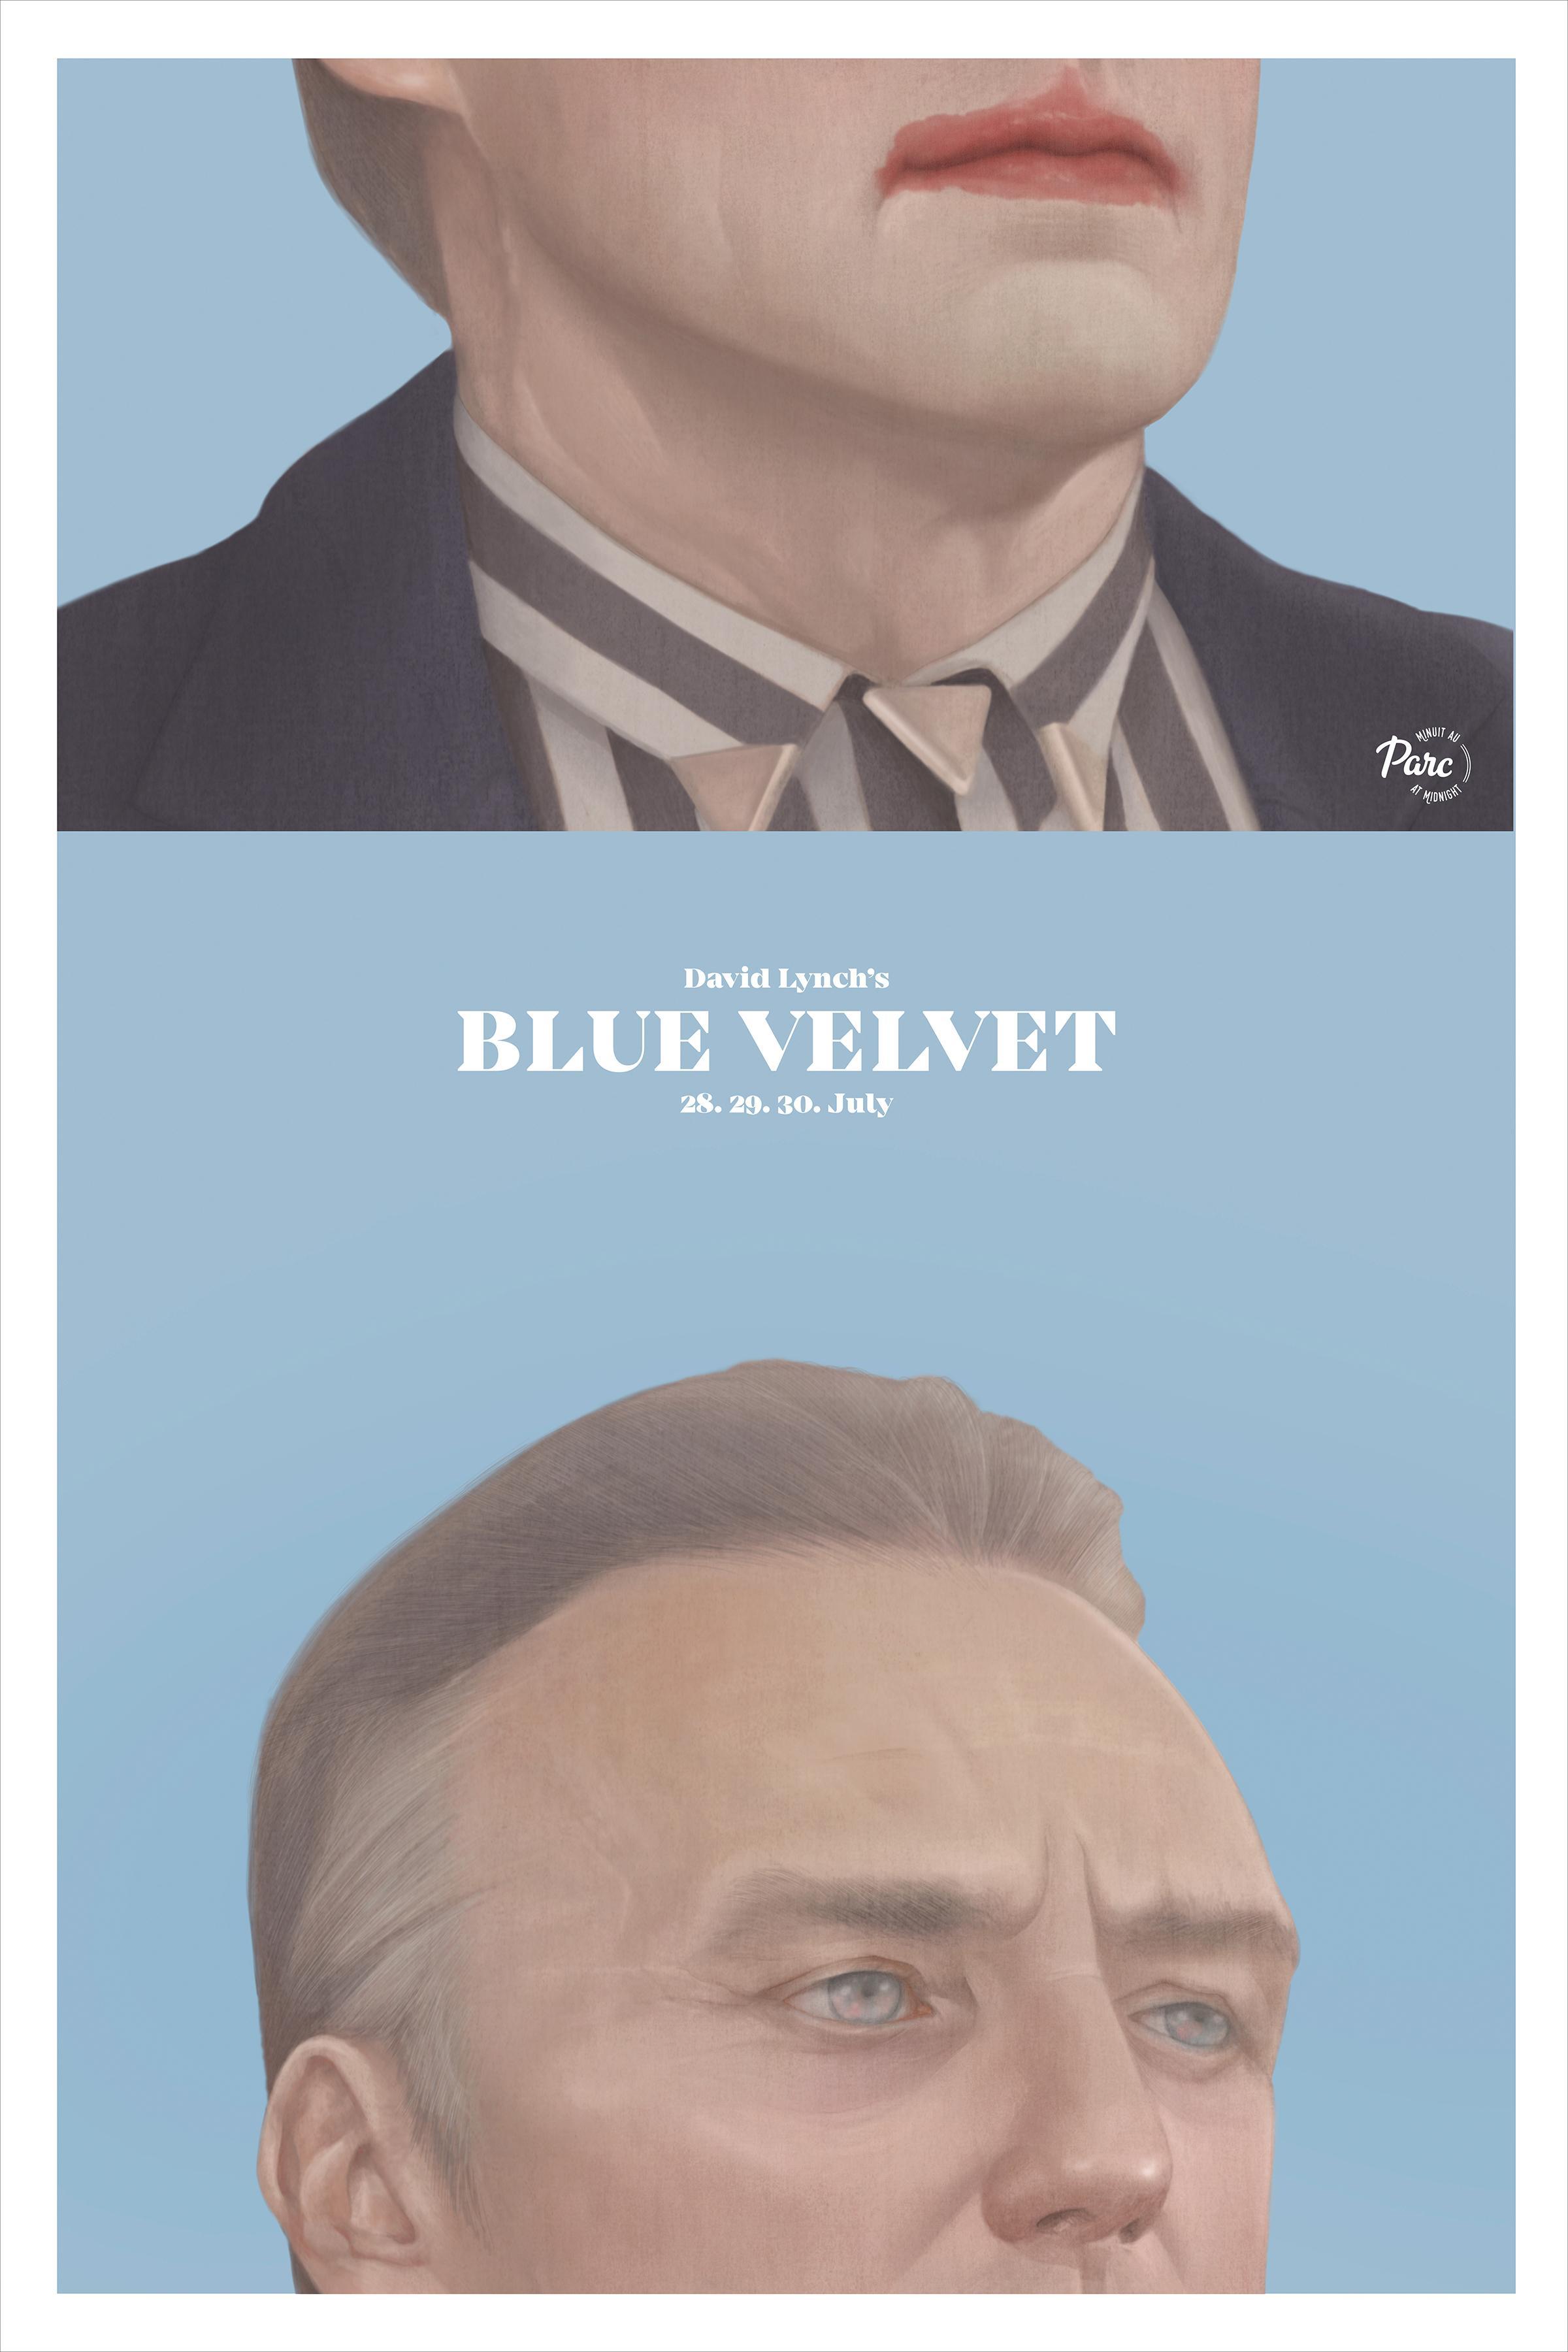 Cinema du Parc Outdoor Ad - Blue Velvet